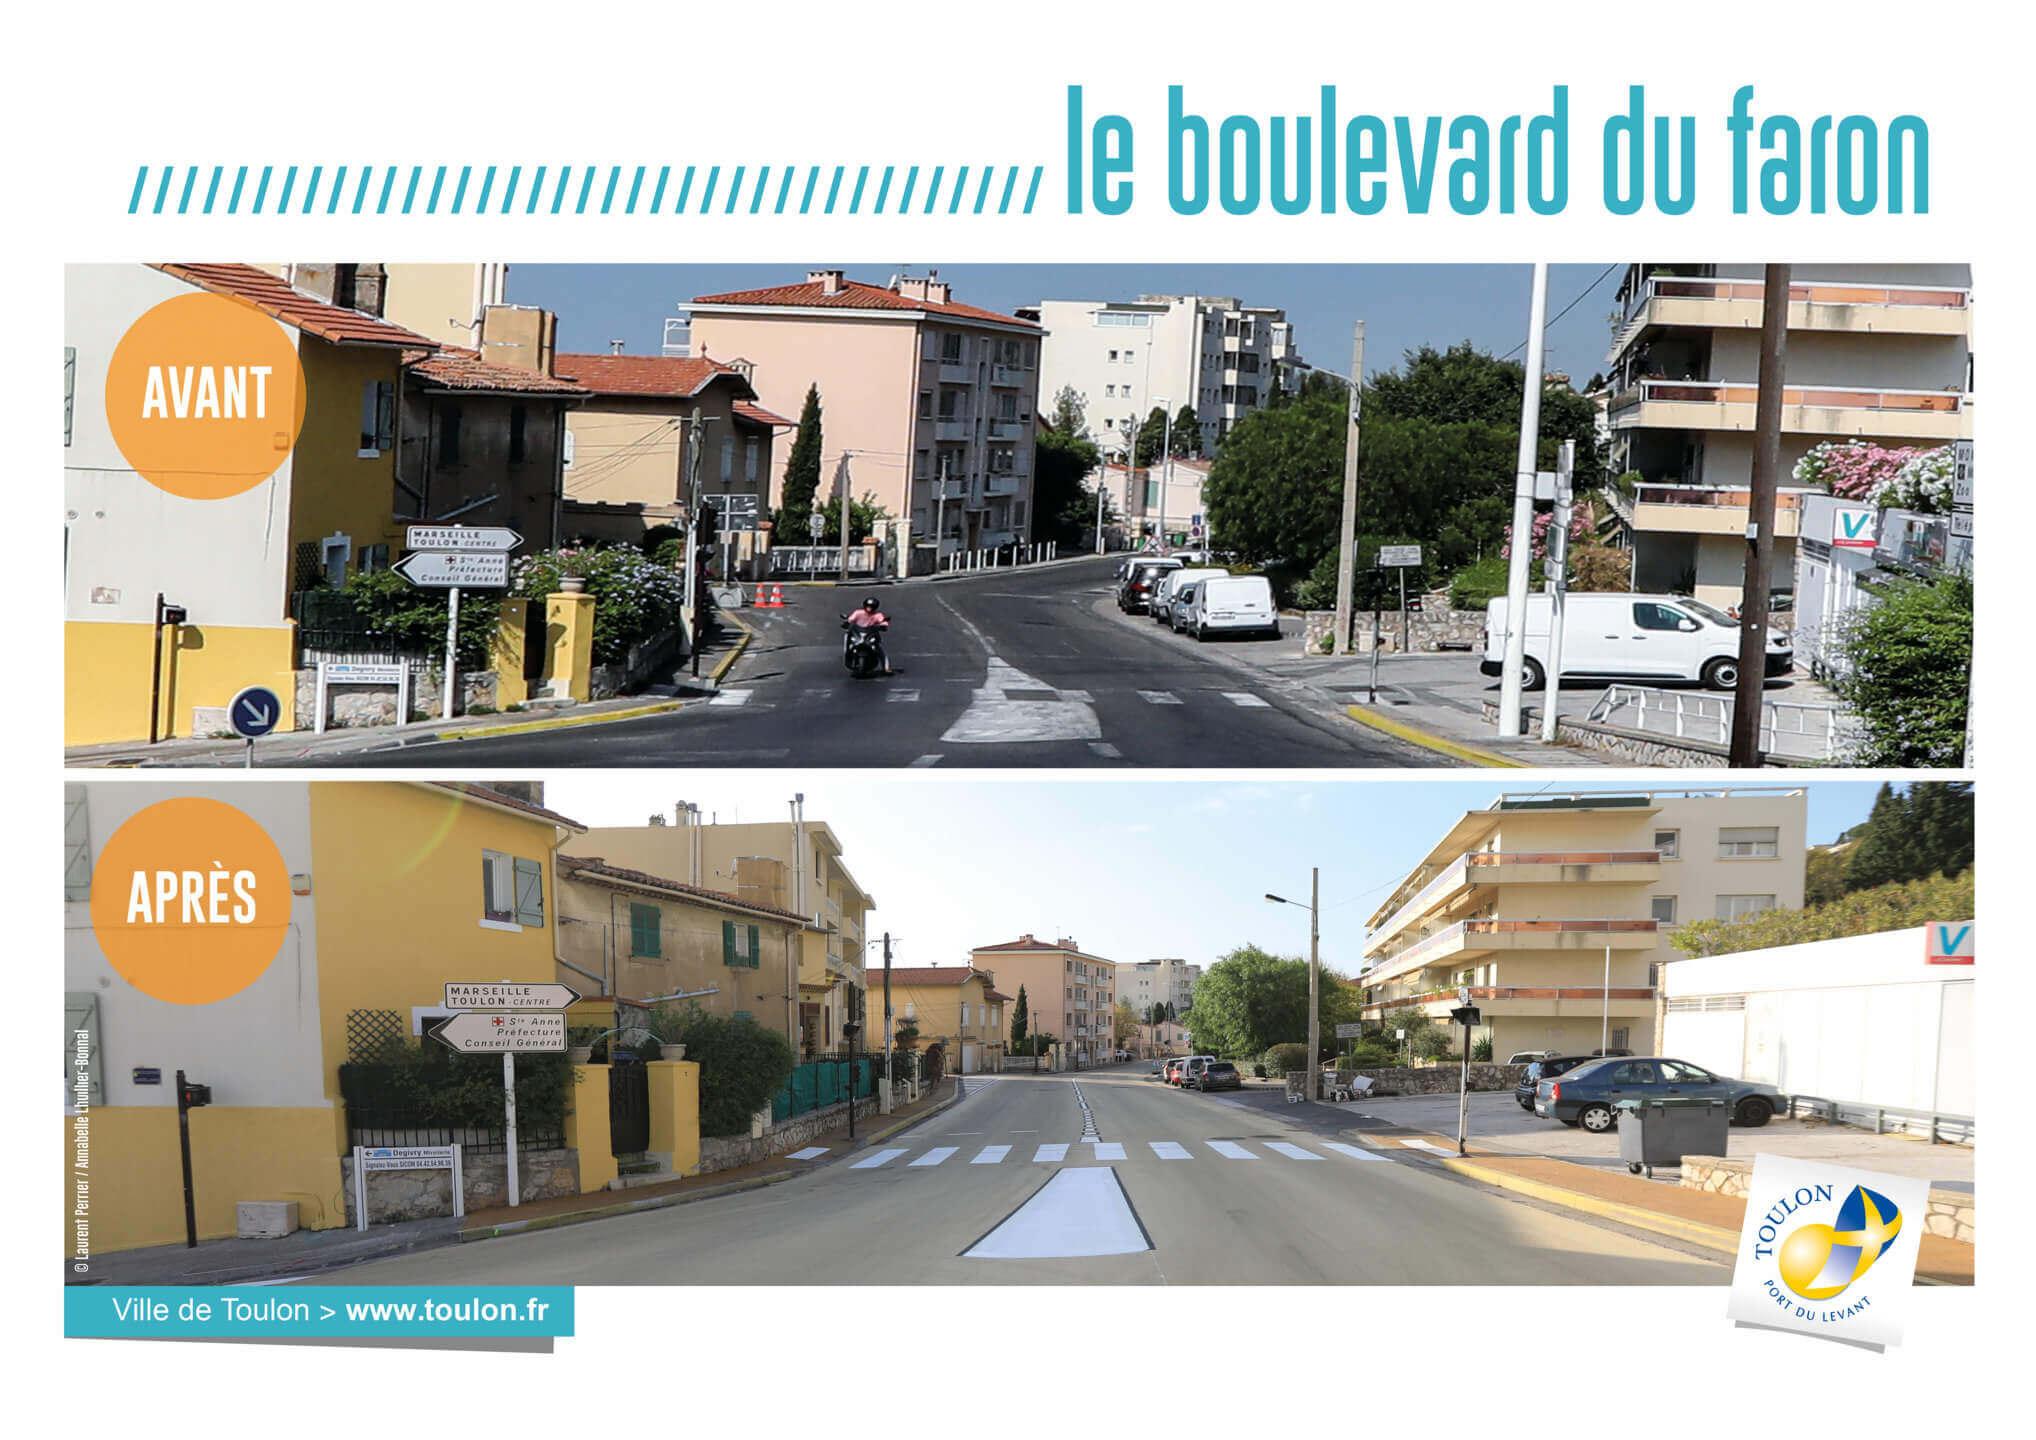 Le boulevard du faron